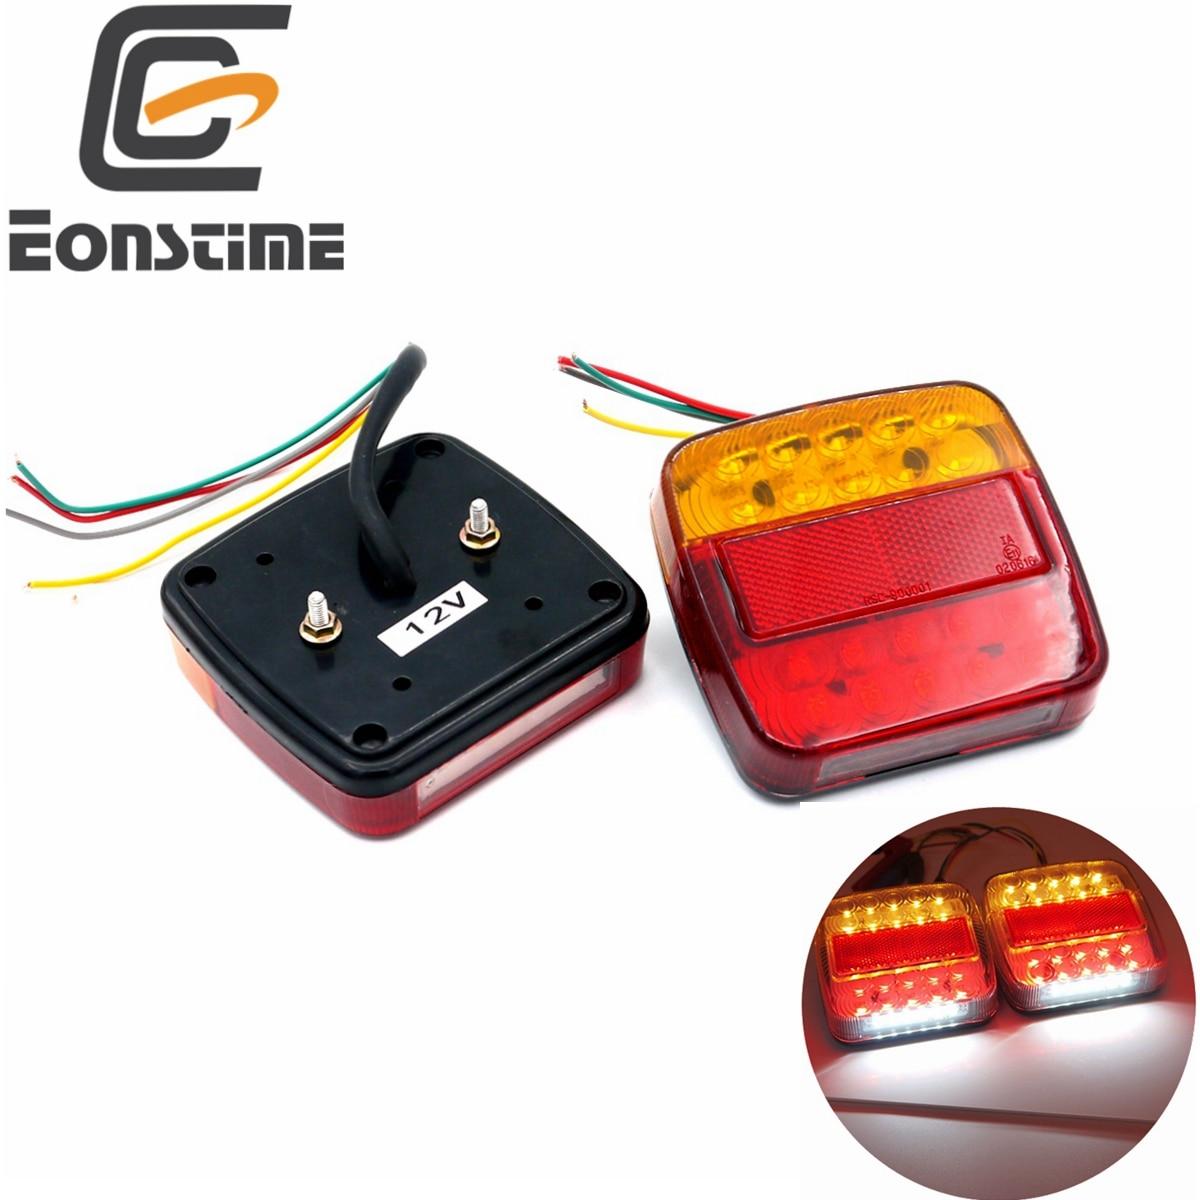 Eonstime Trailer Trucks Tail Light Car 26LED Rear Tail Light Running Turn Signal Rear Lamps Waterproof Tailight Parts 12V